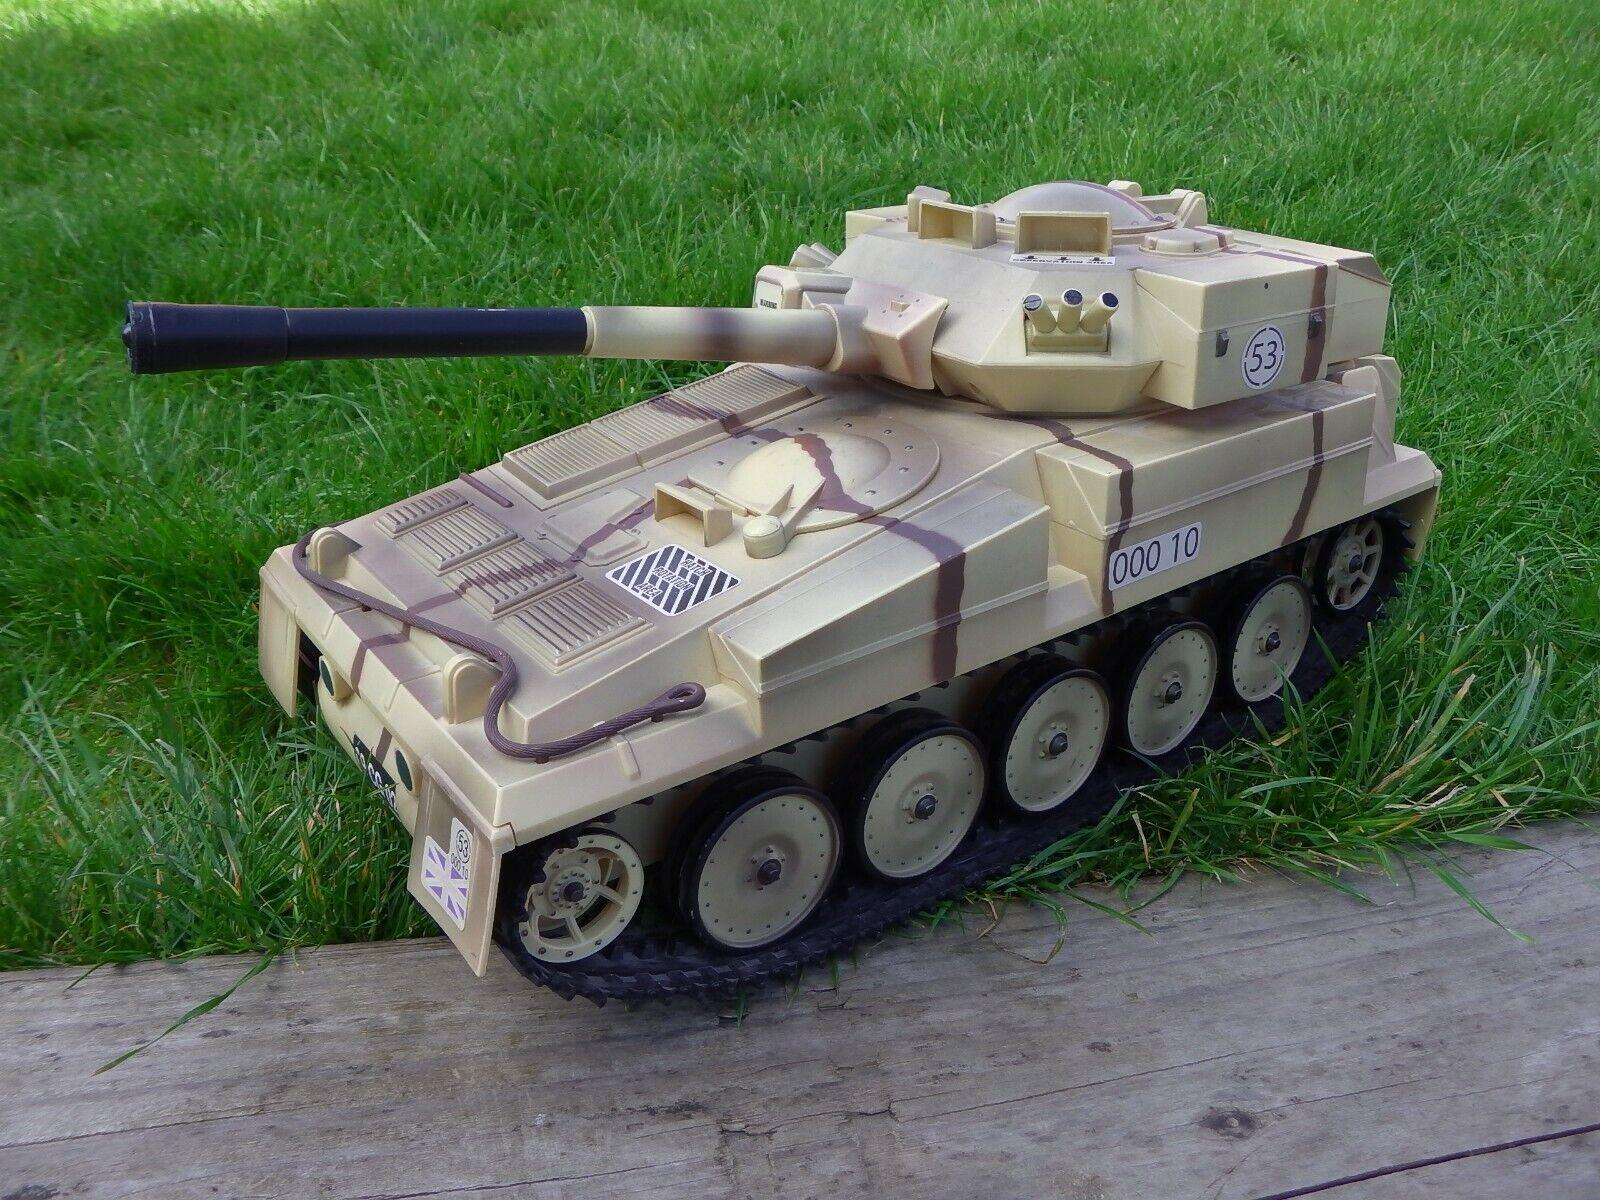 Vinatge 2008 HM Armed Forces Large Fast Pursuit Battle Tank Military Vehicle Toy